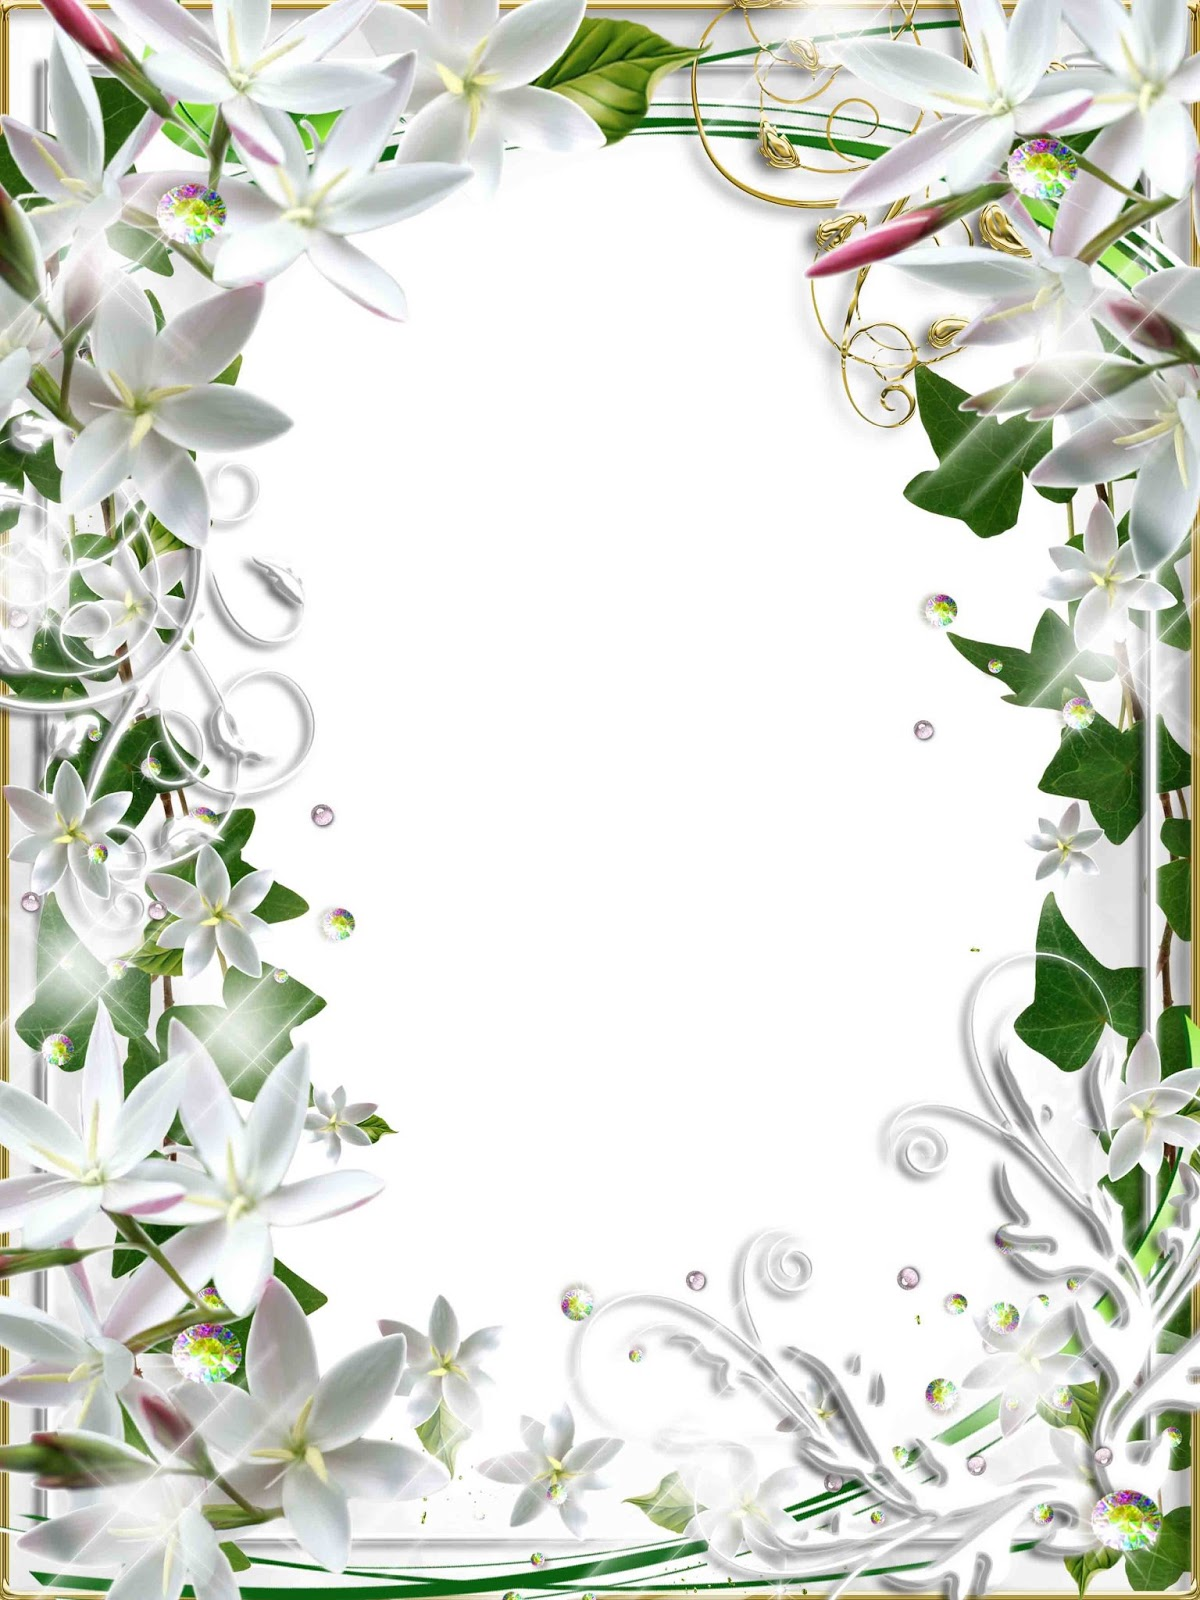 flower frame psd | psd frame